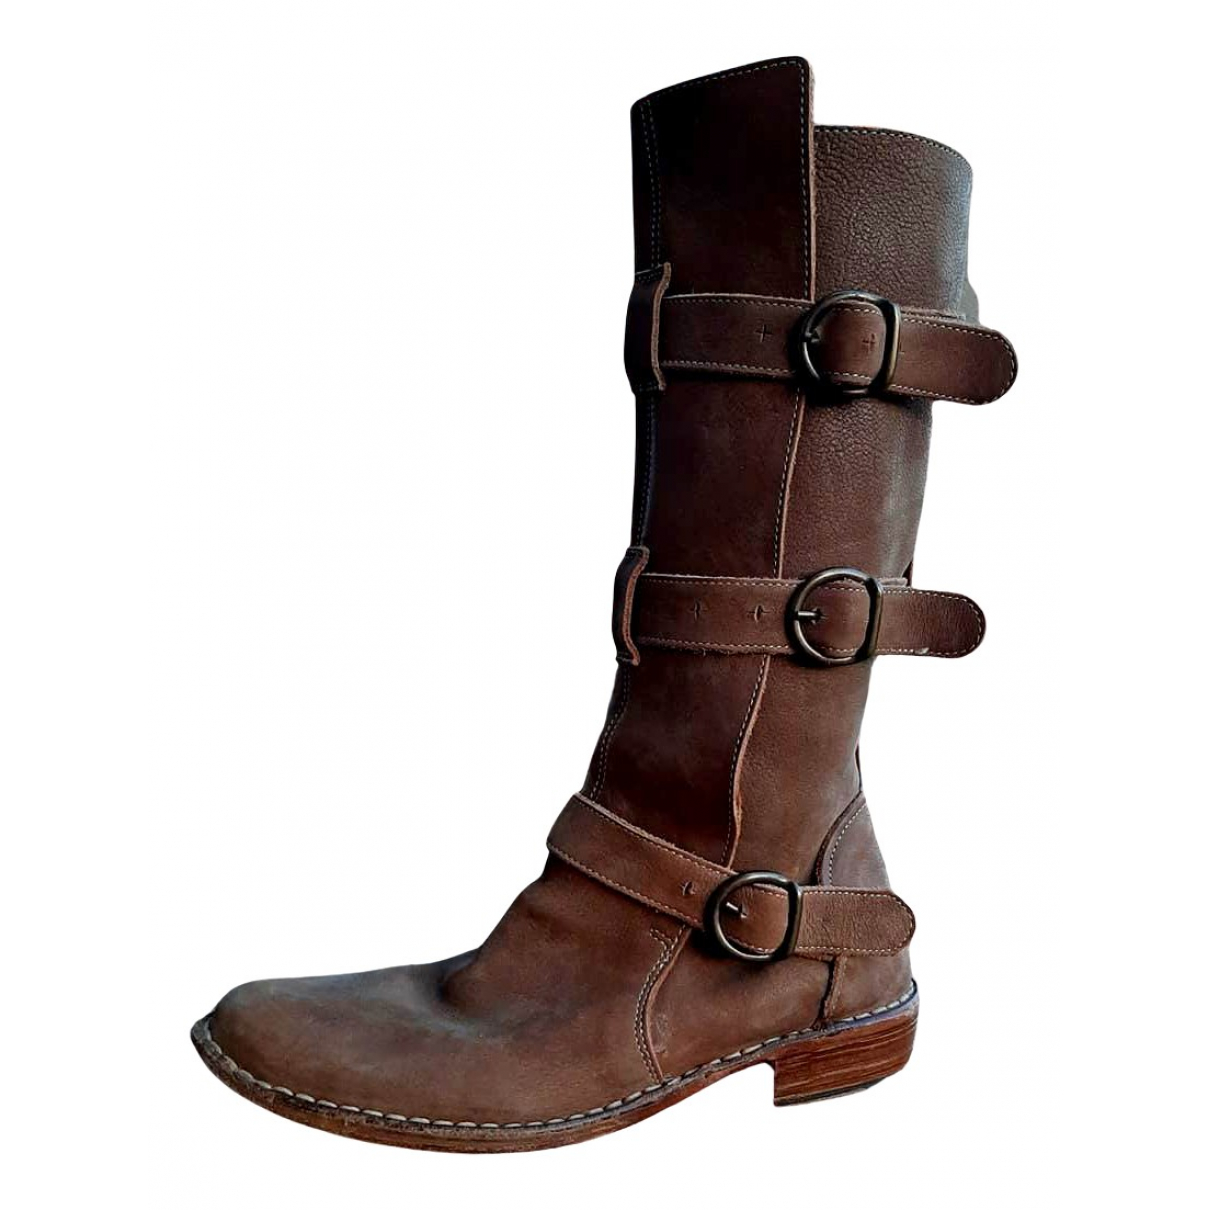 Fiorentini+baker N Beige Leather Boots for Women 39 EU